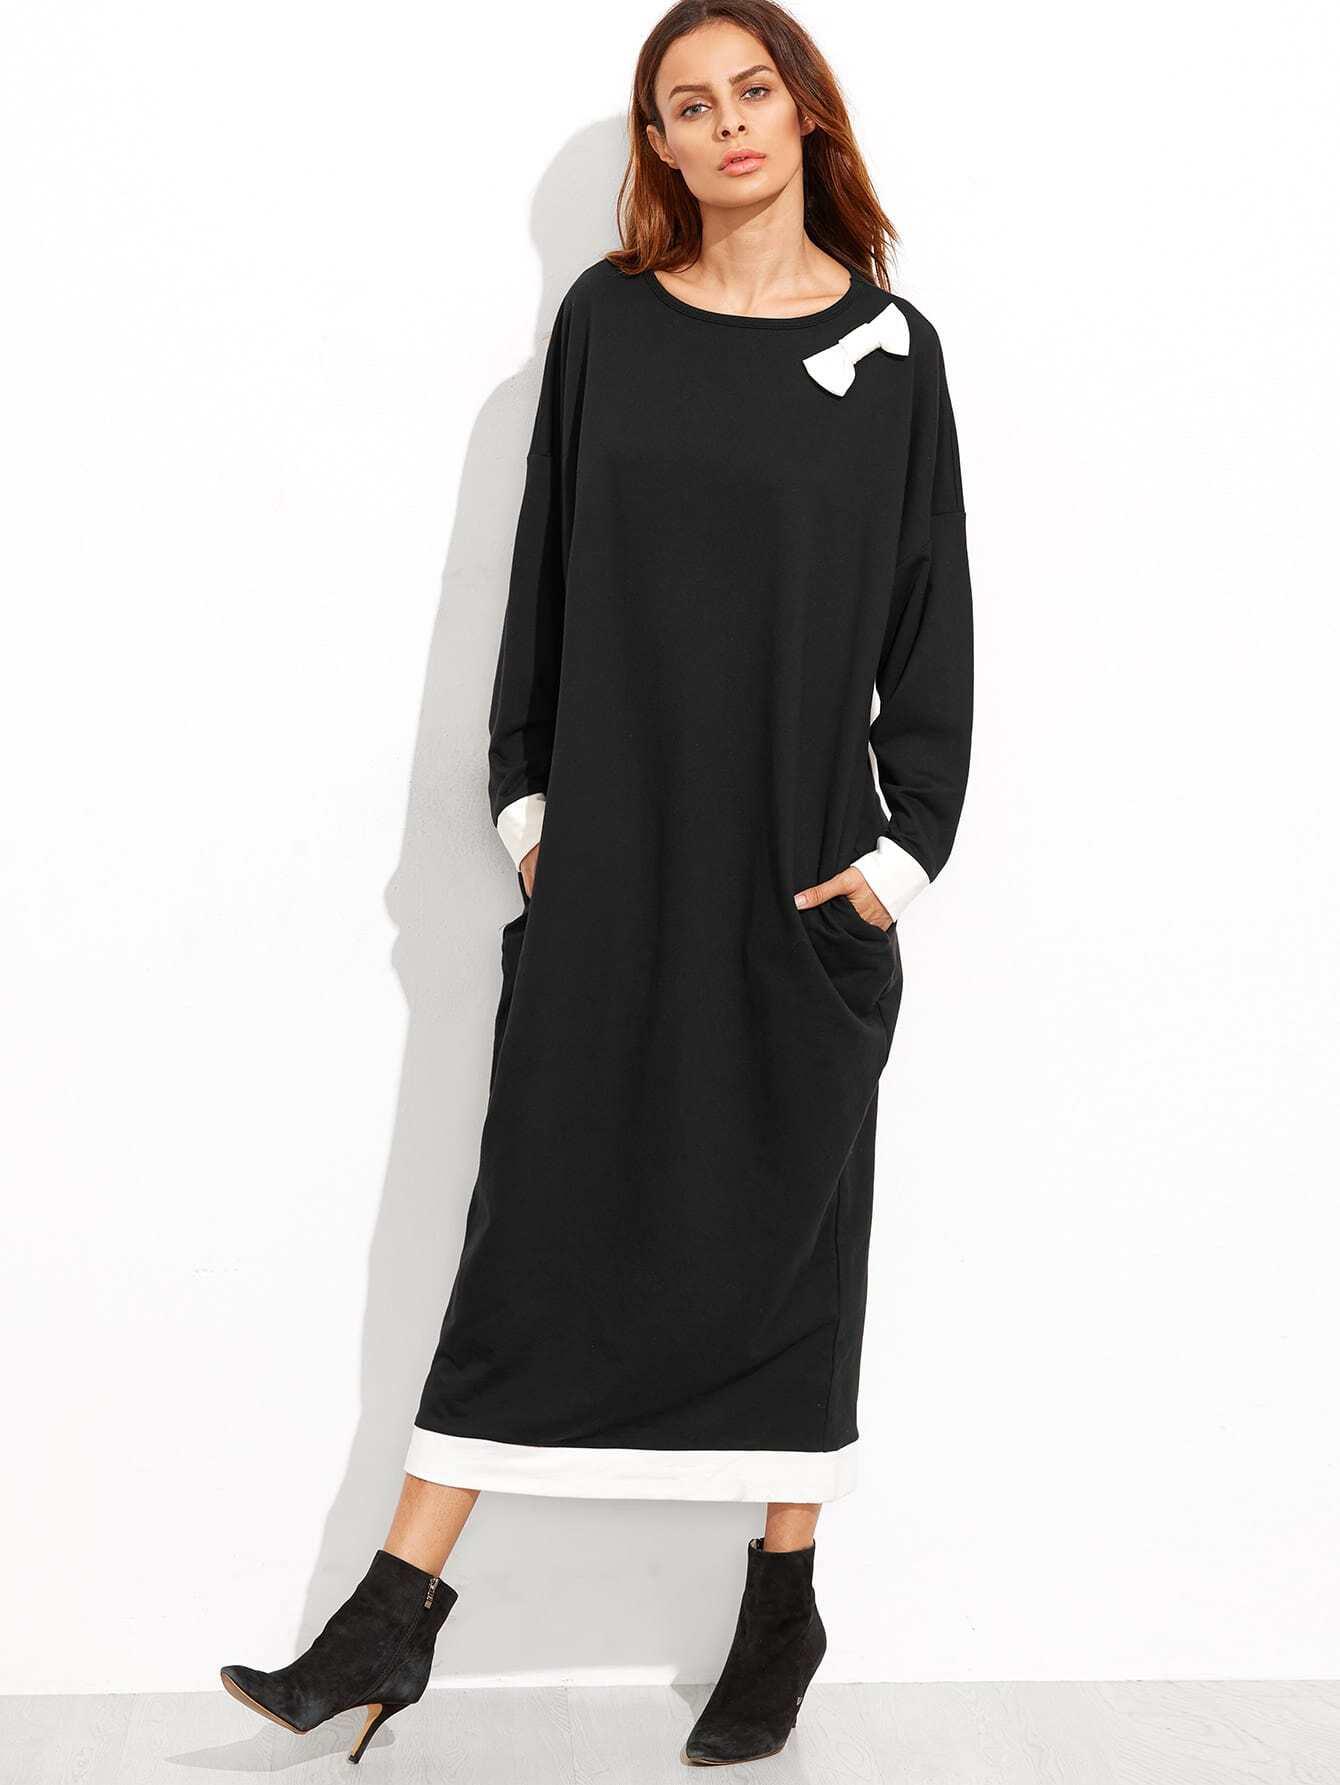 Contrast Bow Sweatshirt Dress With PocketsContrast Bow Sweatshirt Dress With Pockets<br><br>color: Black<br>size: L,M,S,XS